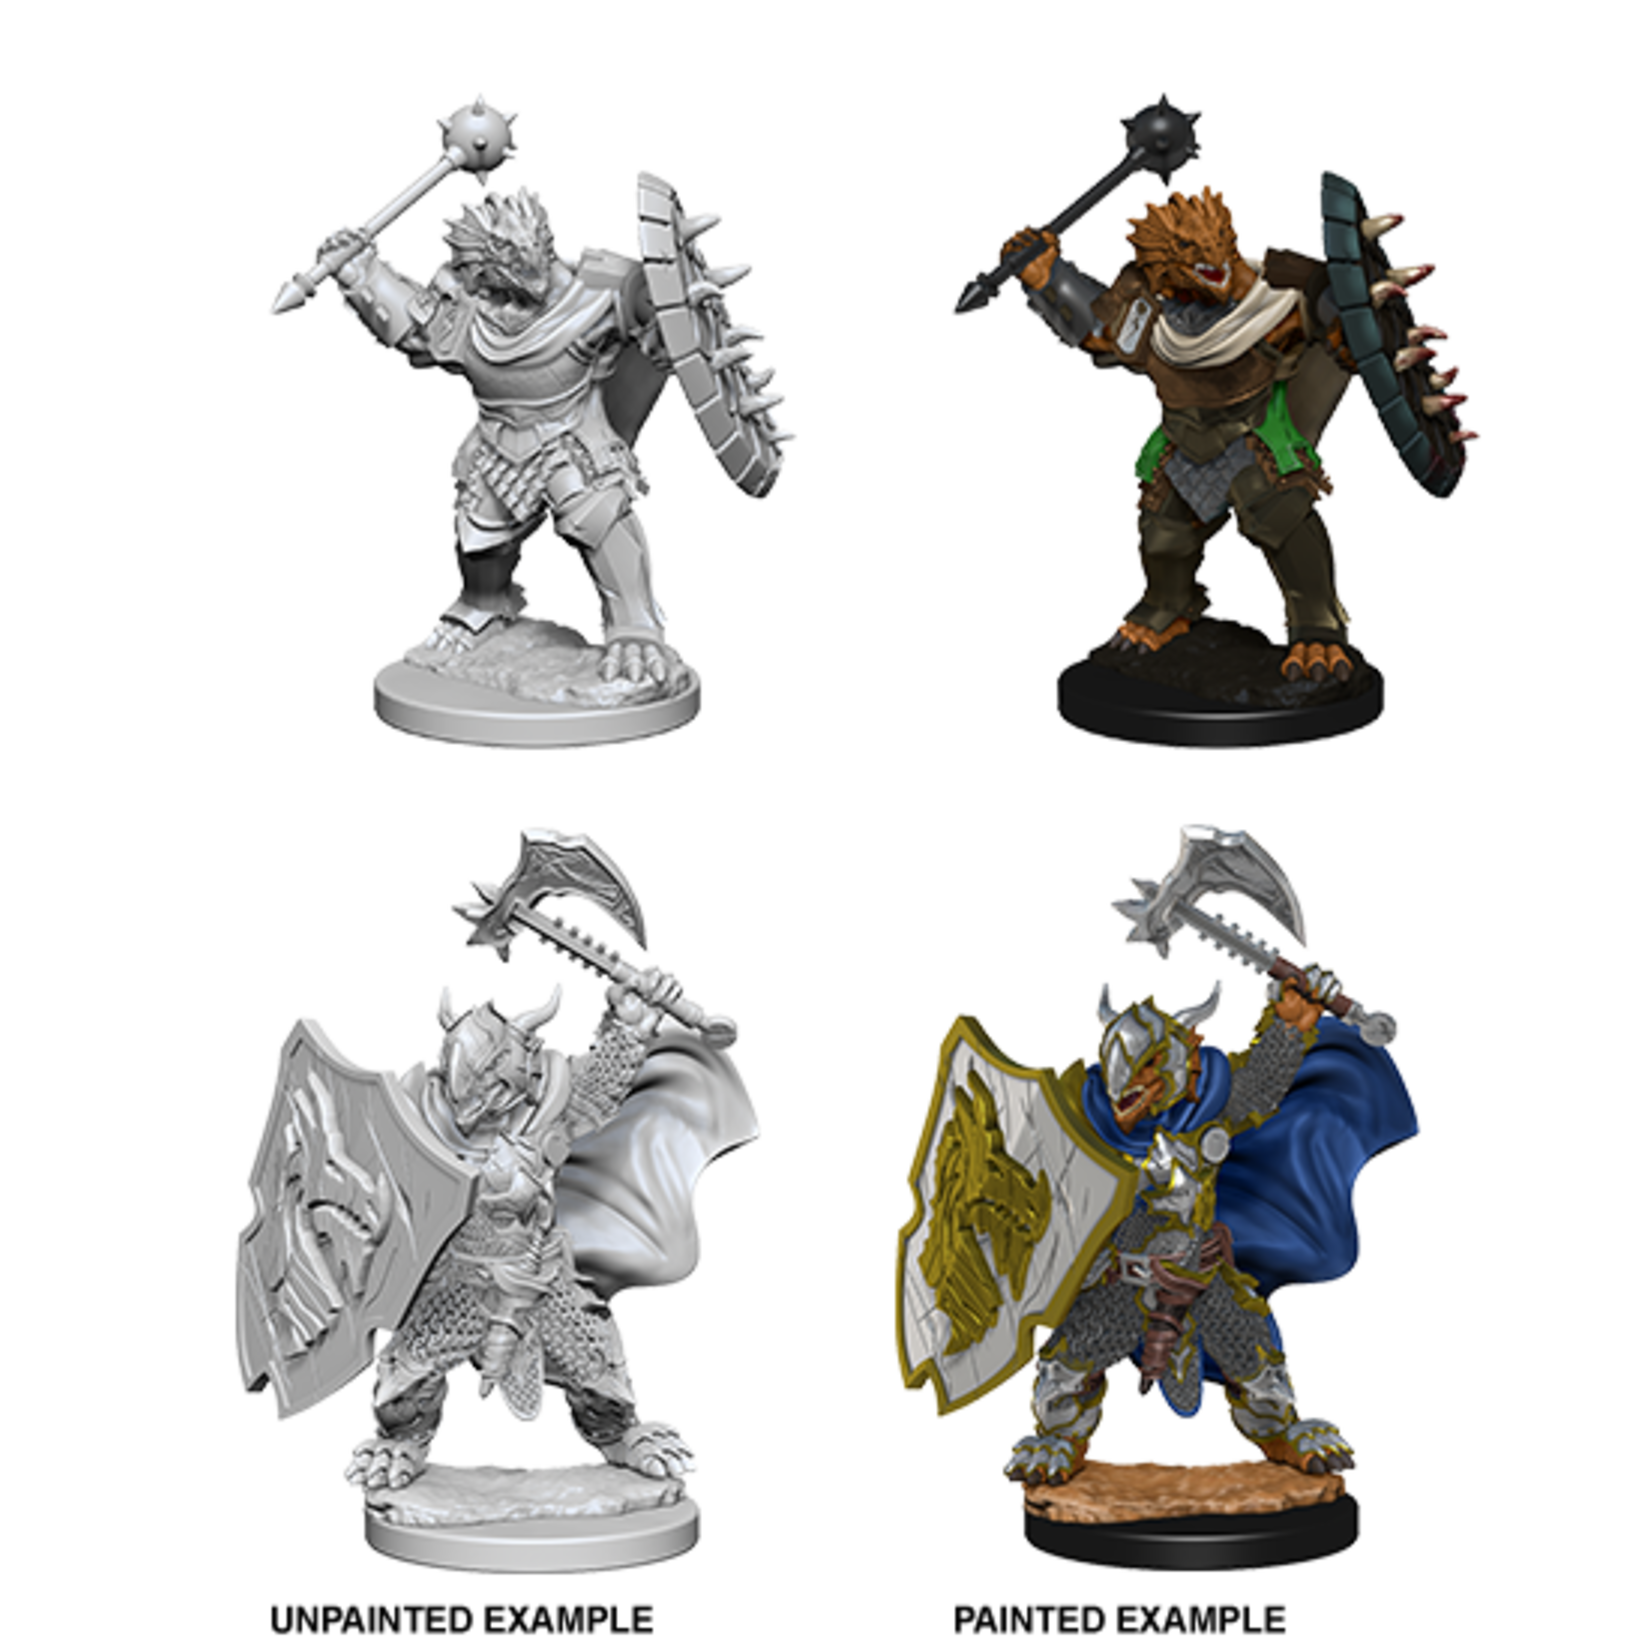 WizKids D&D Nolzur's Marvelous Miniatures: Dragonborn Paladin with Mace/Axe & Shield (W4)